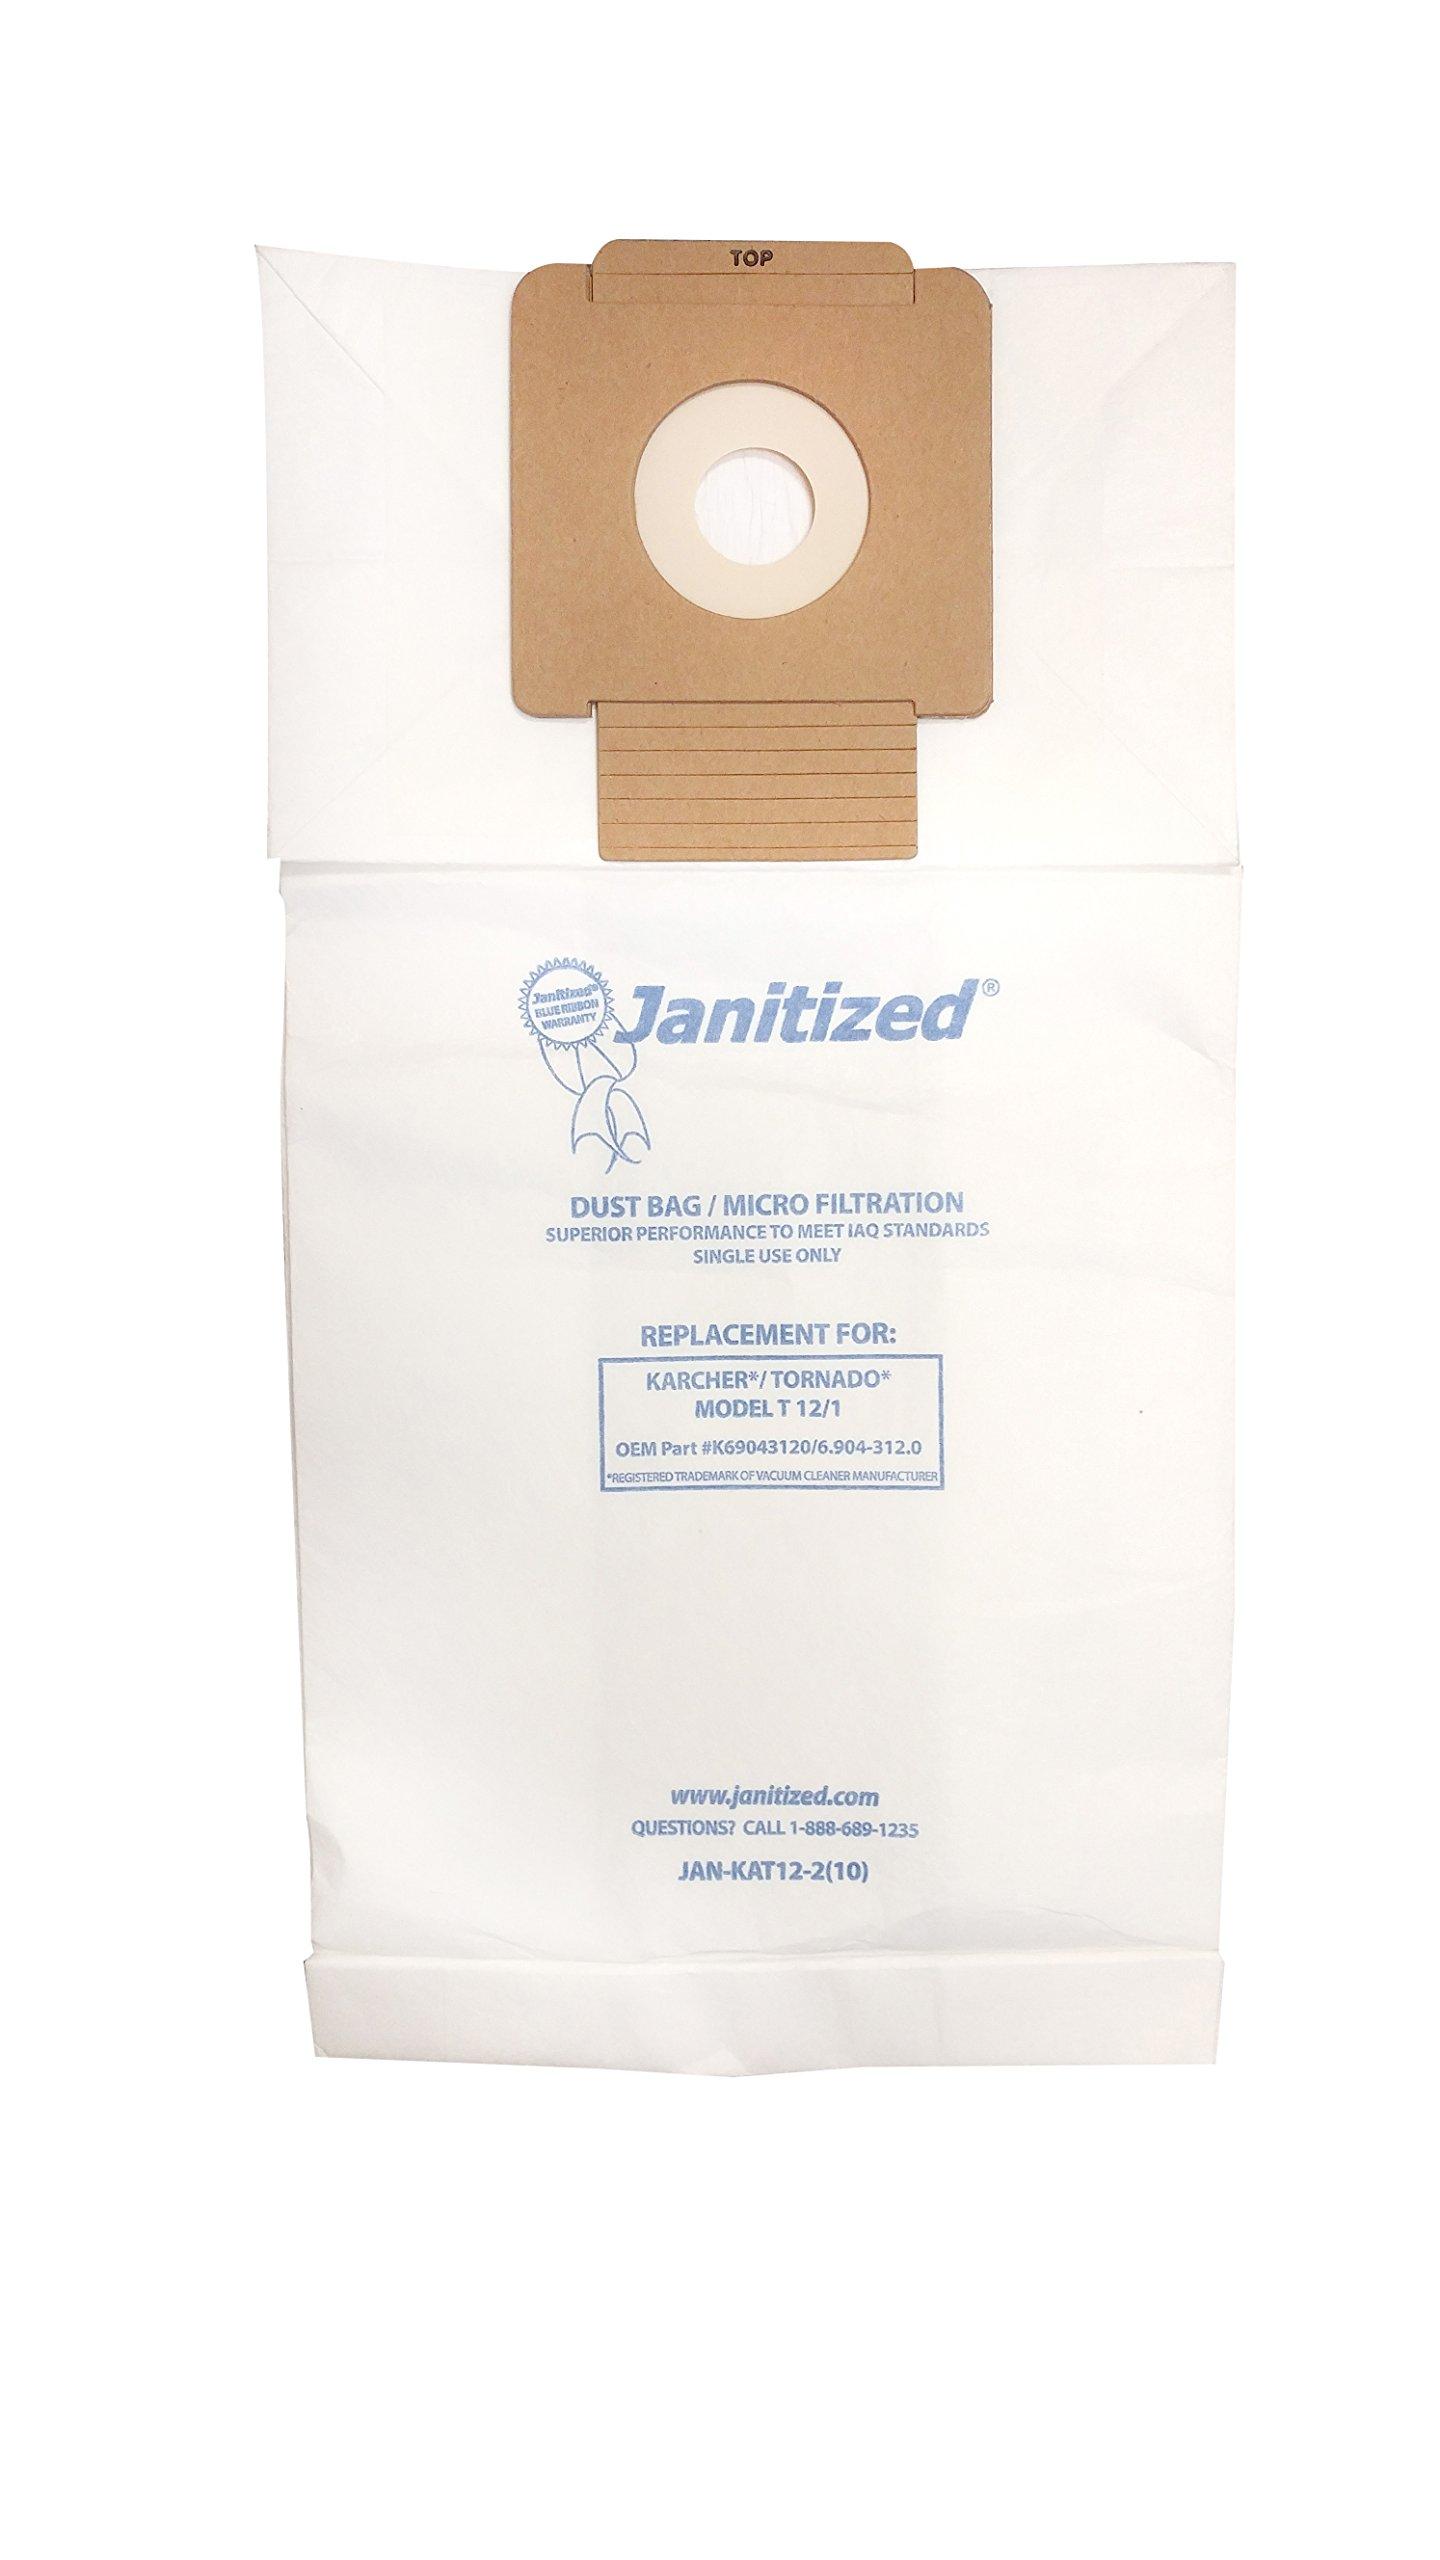 Janitized JAN-KAT12-2(10) Premium Replacement Commercial Vacuum Paper Bag, for Karcher/Tornado Model T12/1 Vacuum Cleaner (10-10 Packs)